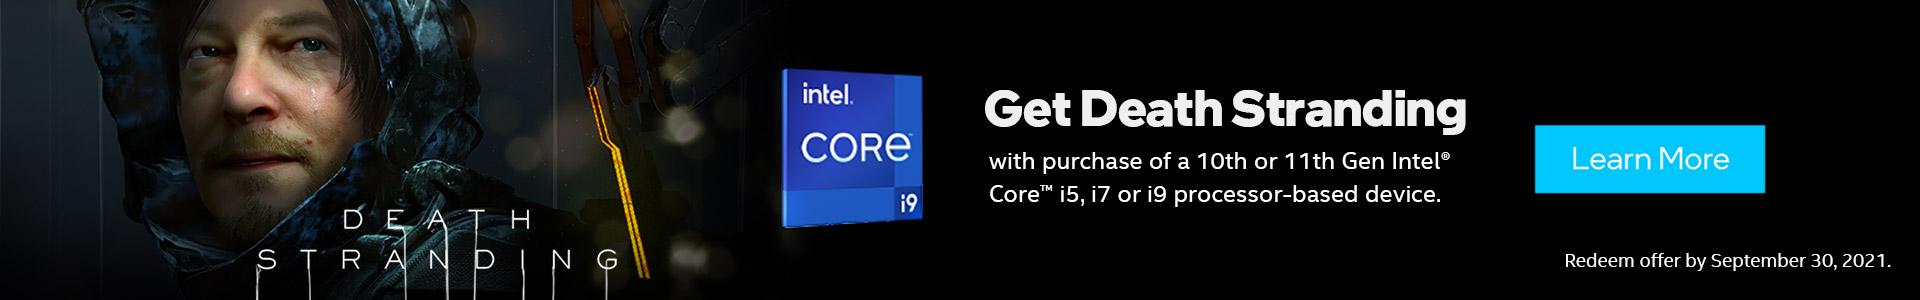 Intel Promo